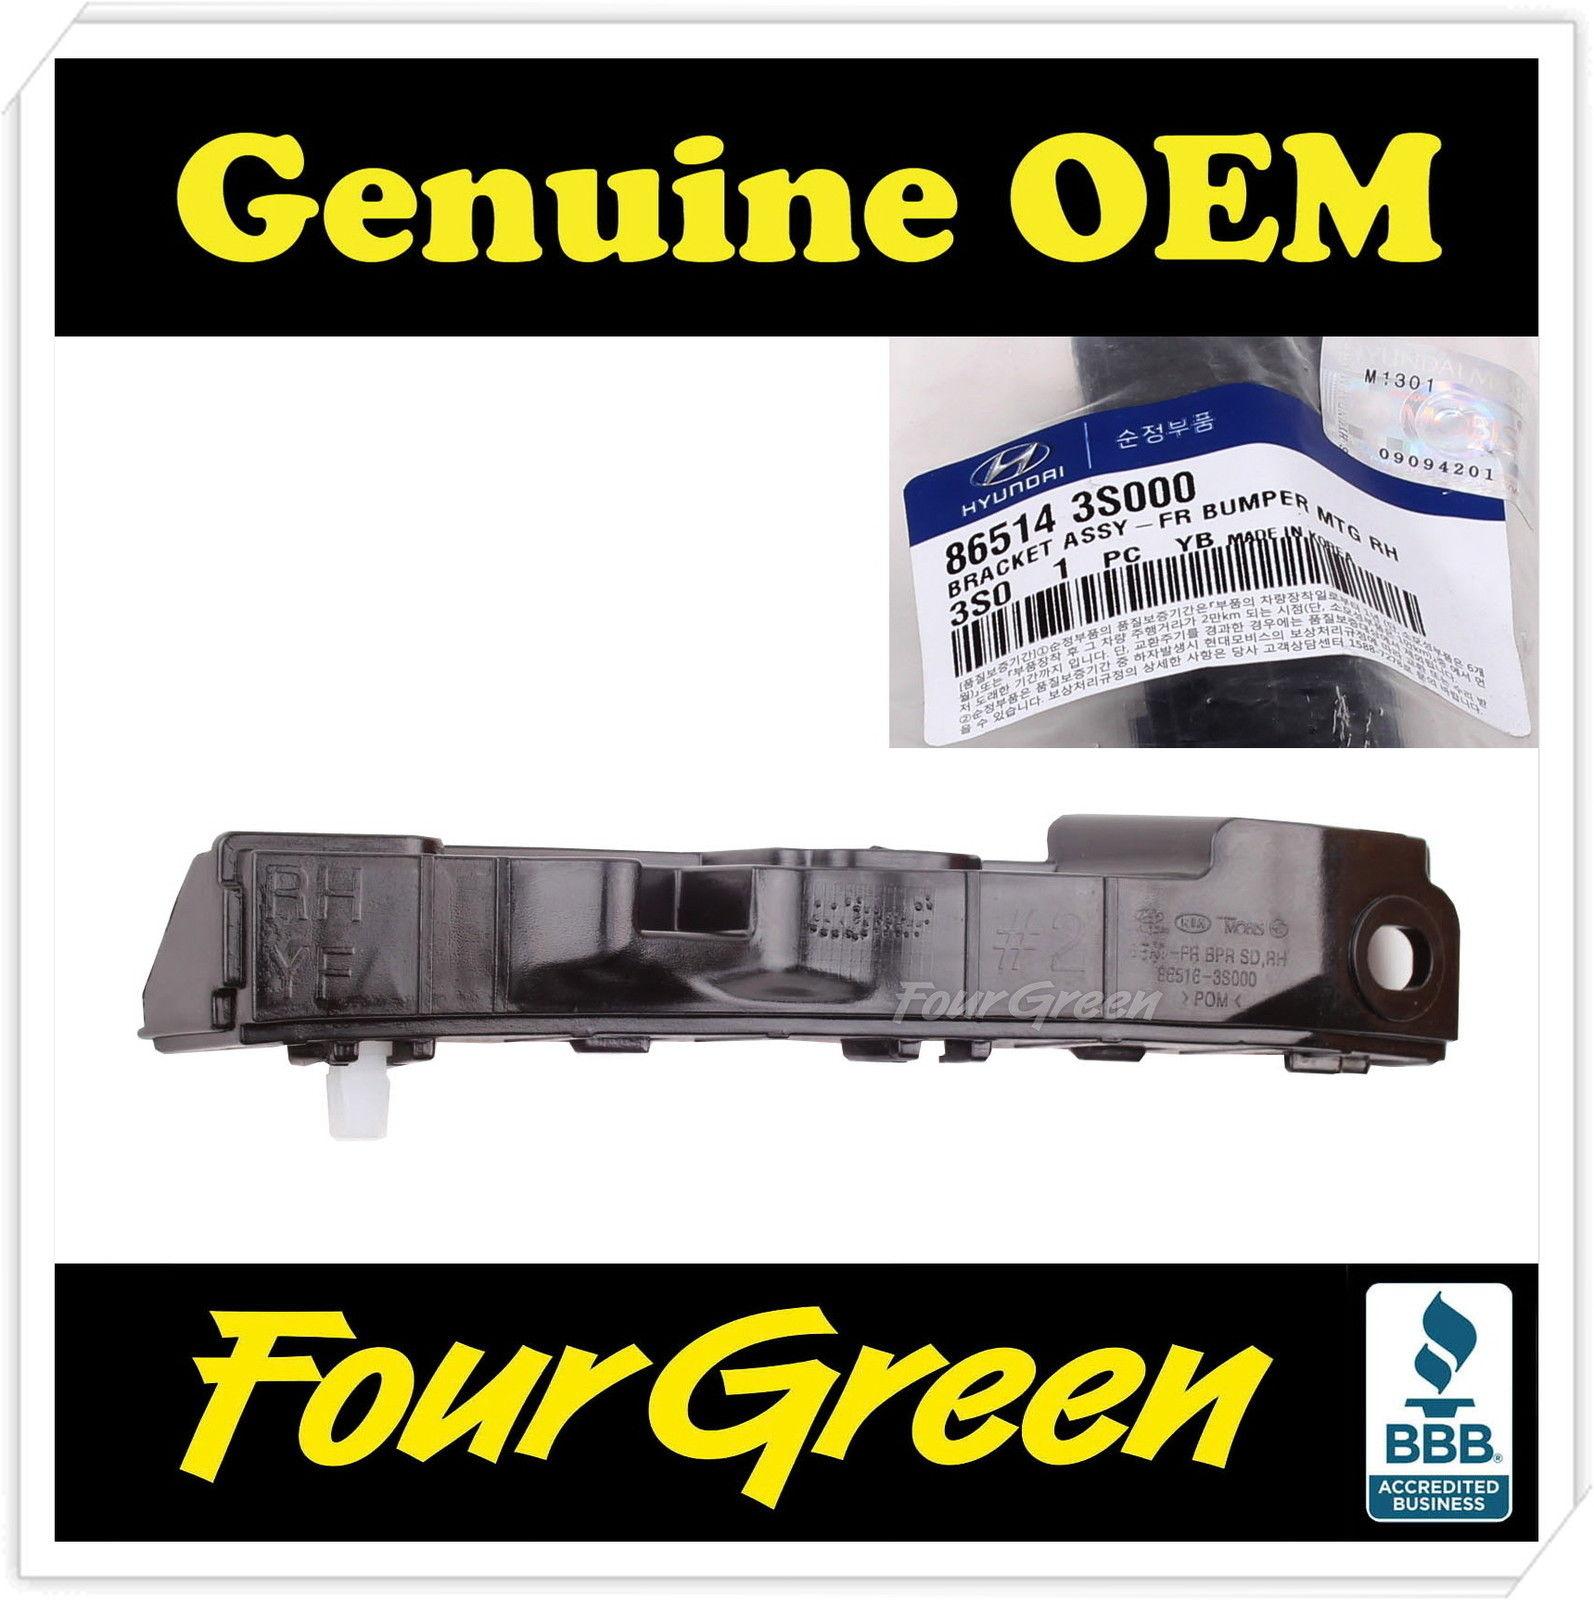 Genuine Front Right side bumper bracket for Sonata 2011-2014 OEM [865143S000]